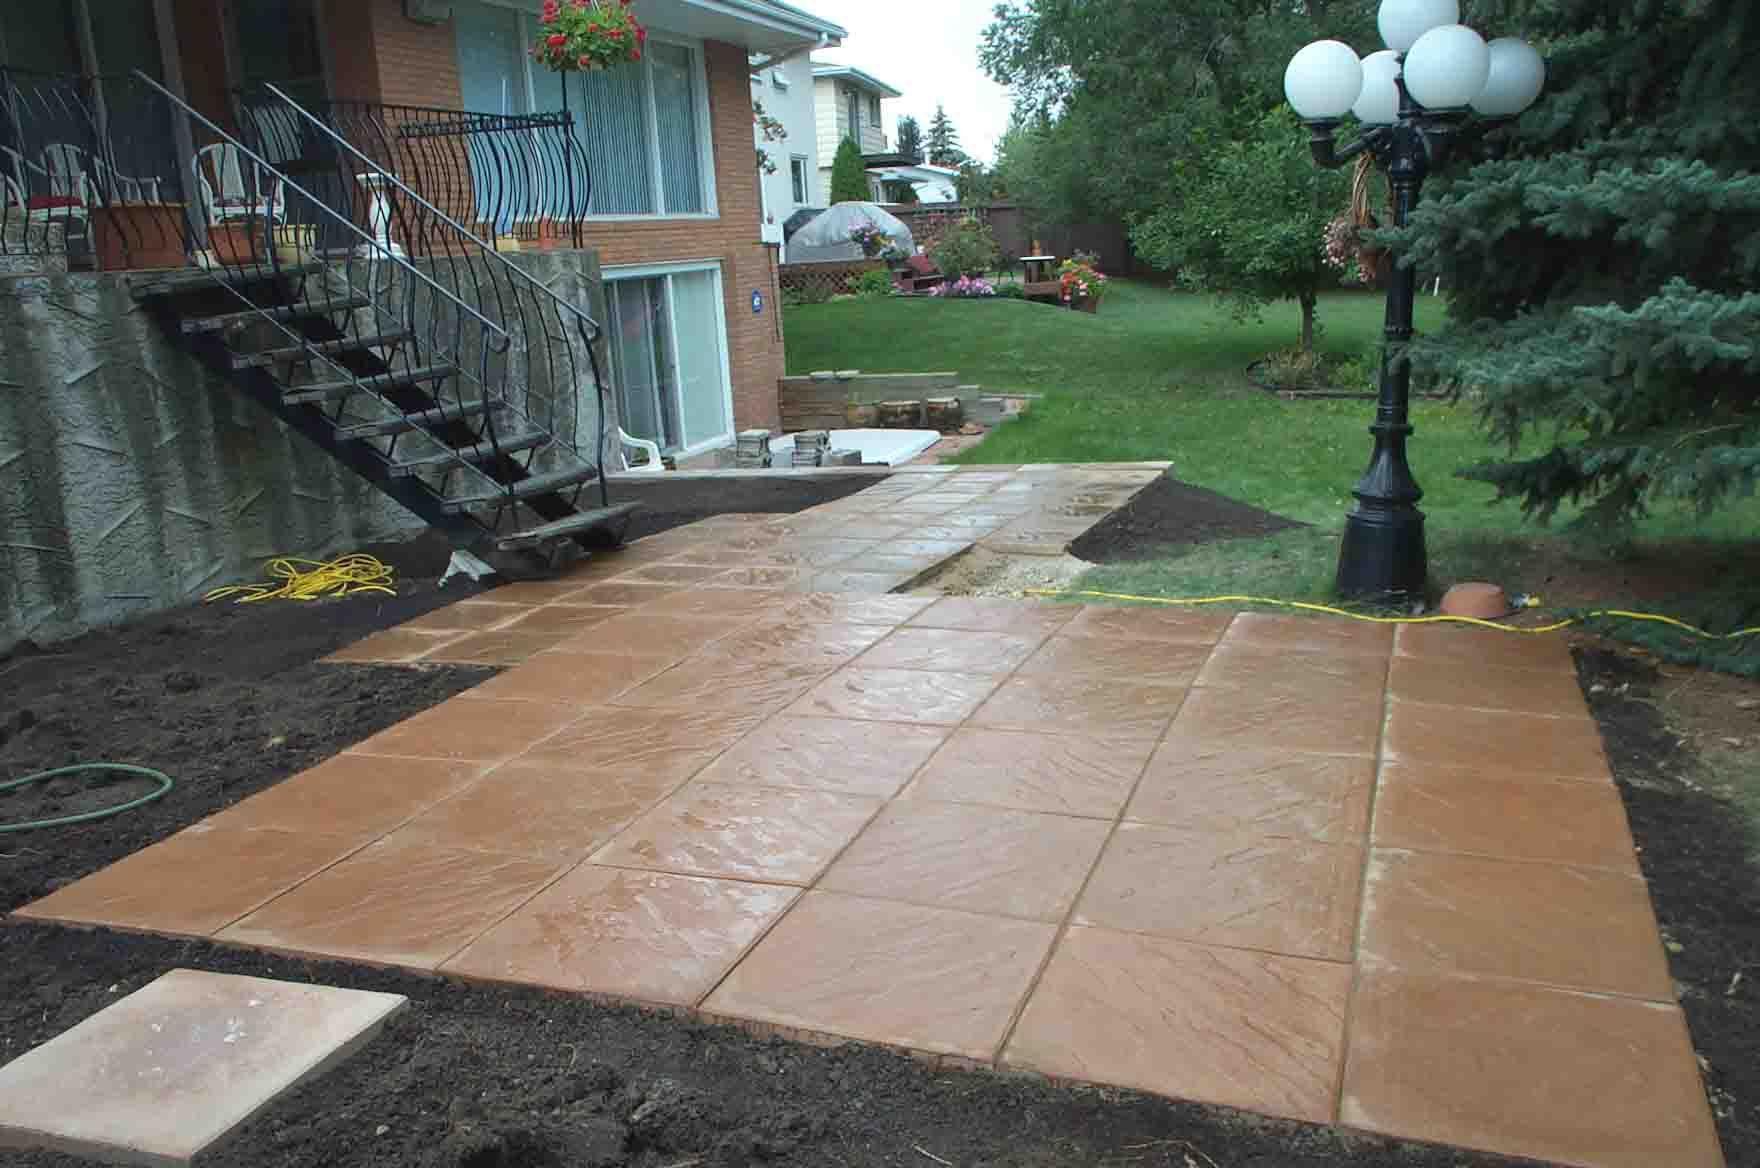 Concrete block patio patio patio blocks cement patio